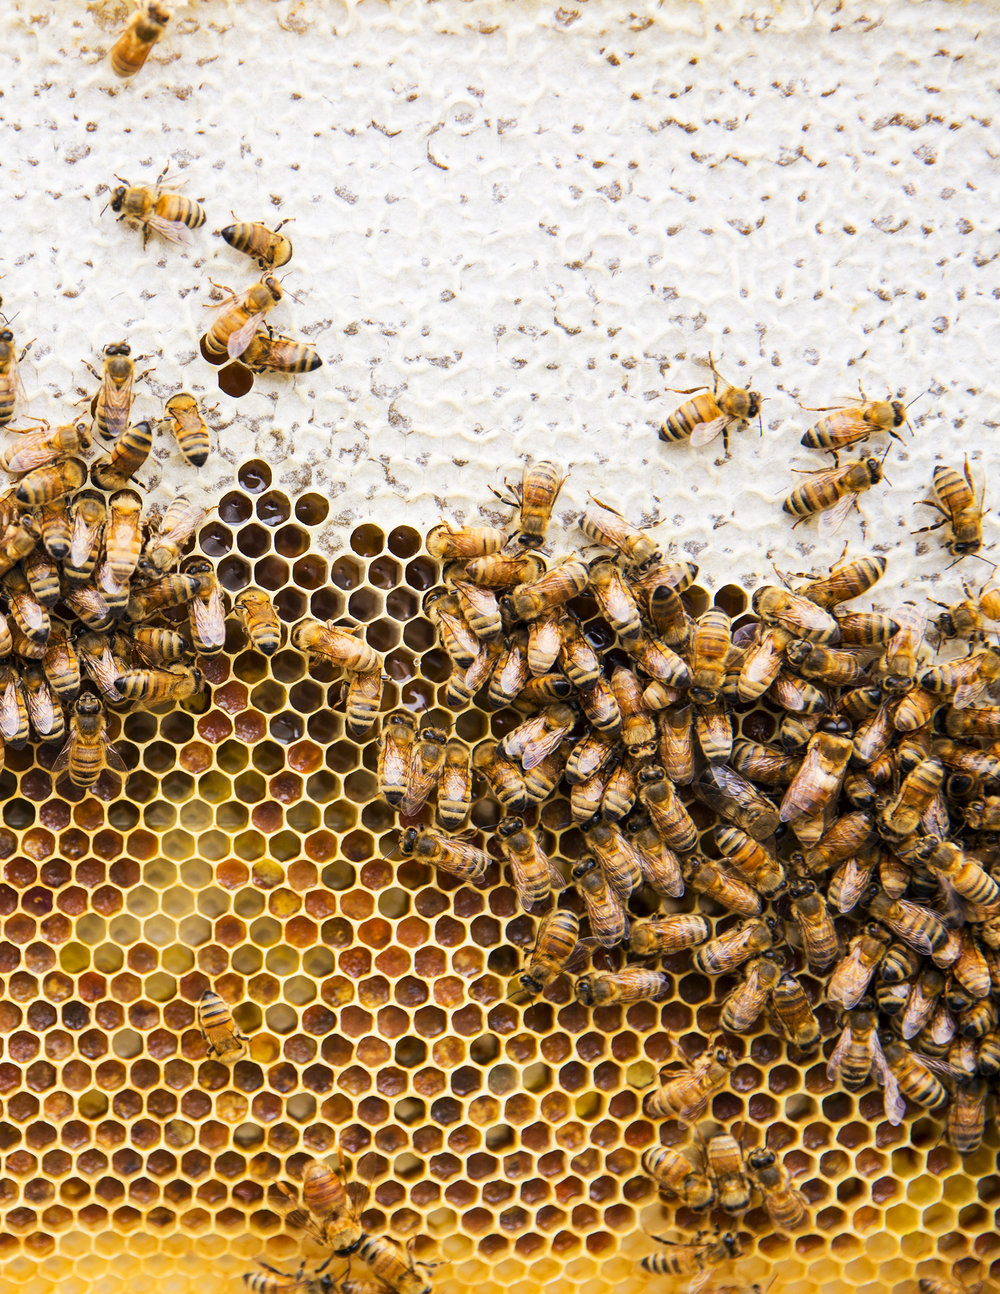 Burggraaf_Charity-Seattle_Food_Photographer-Beekeeping-Hive.jpg